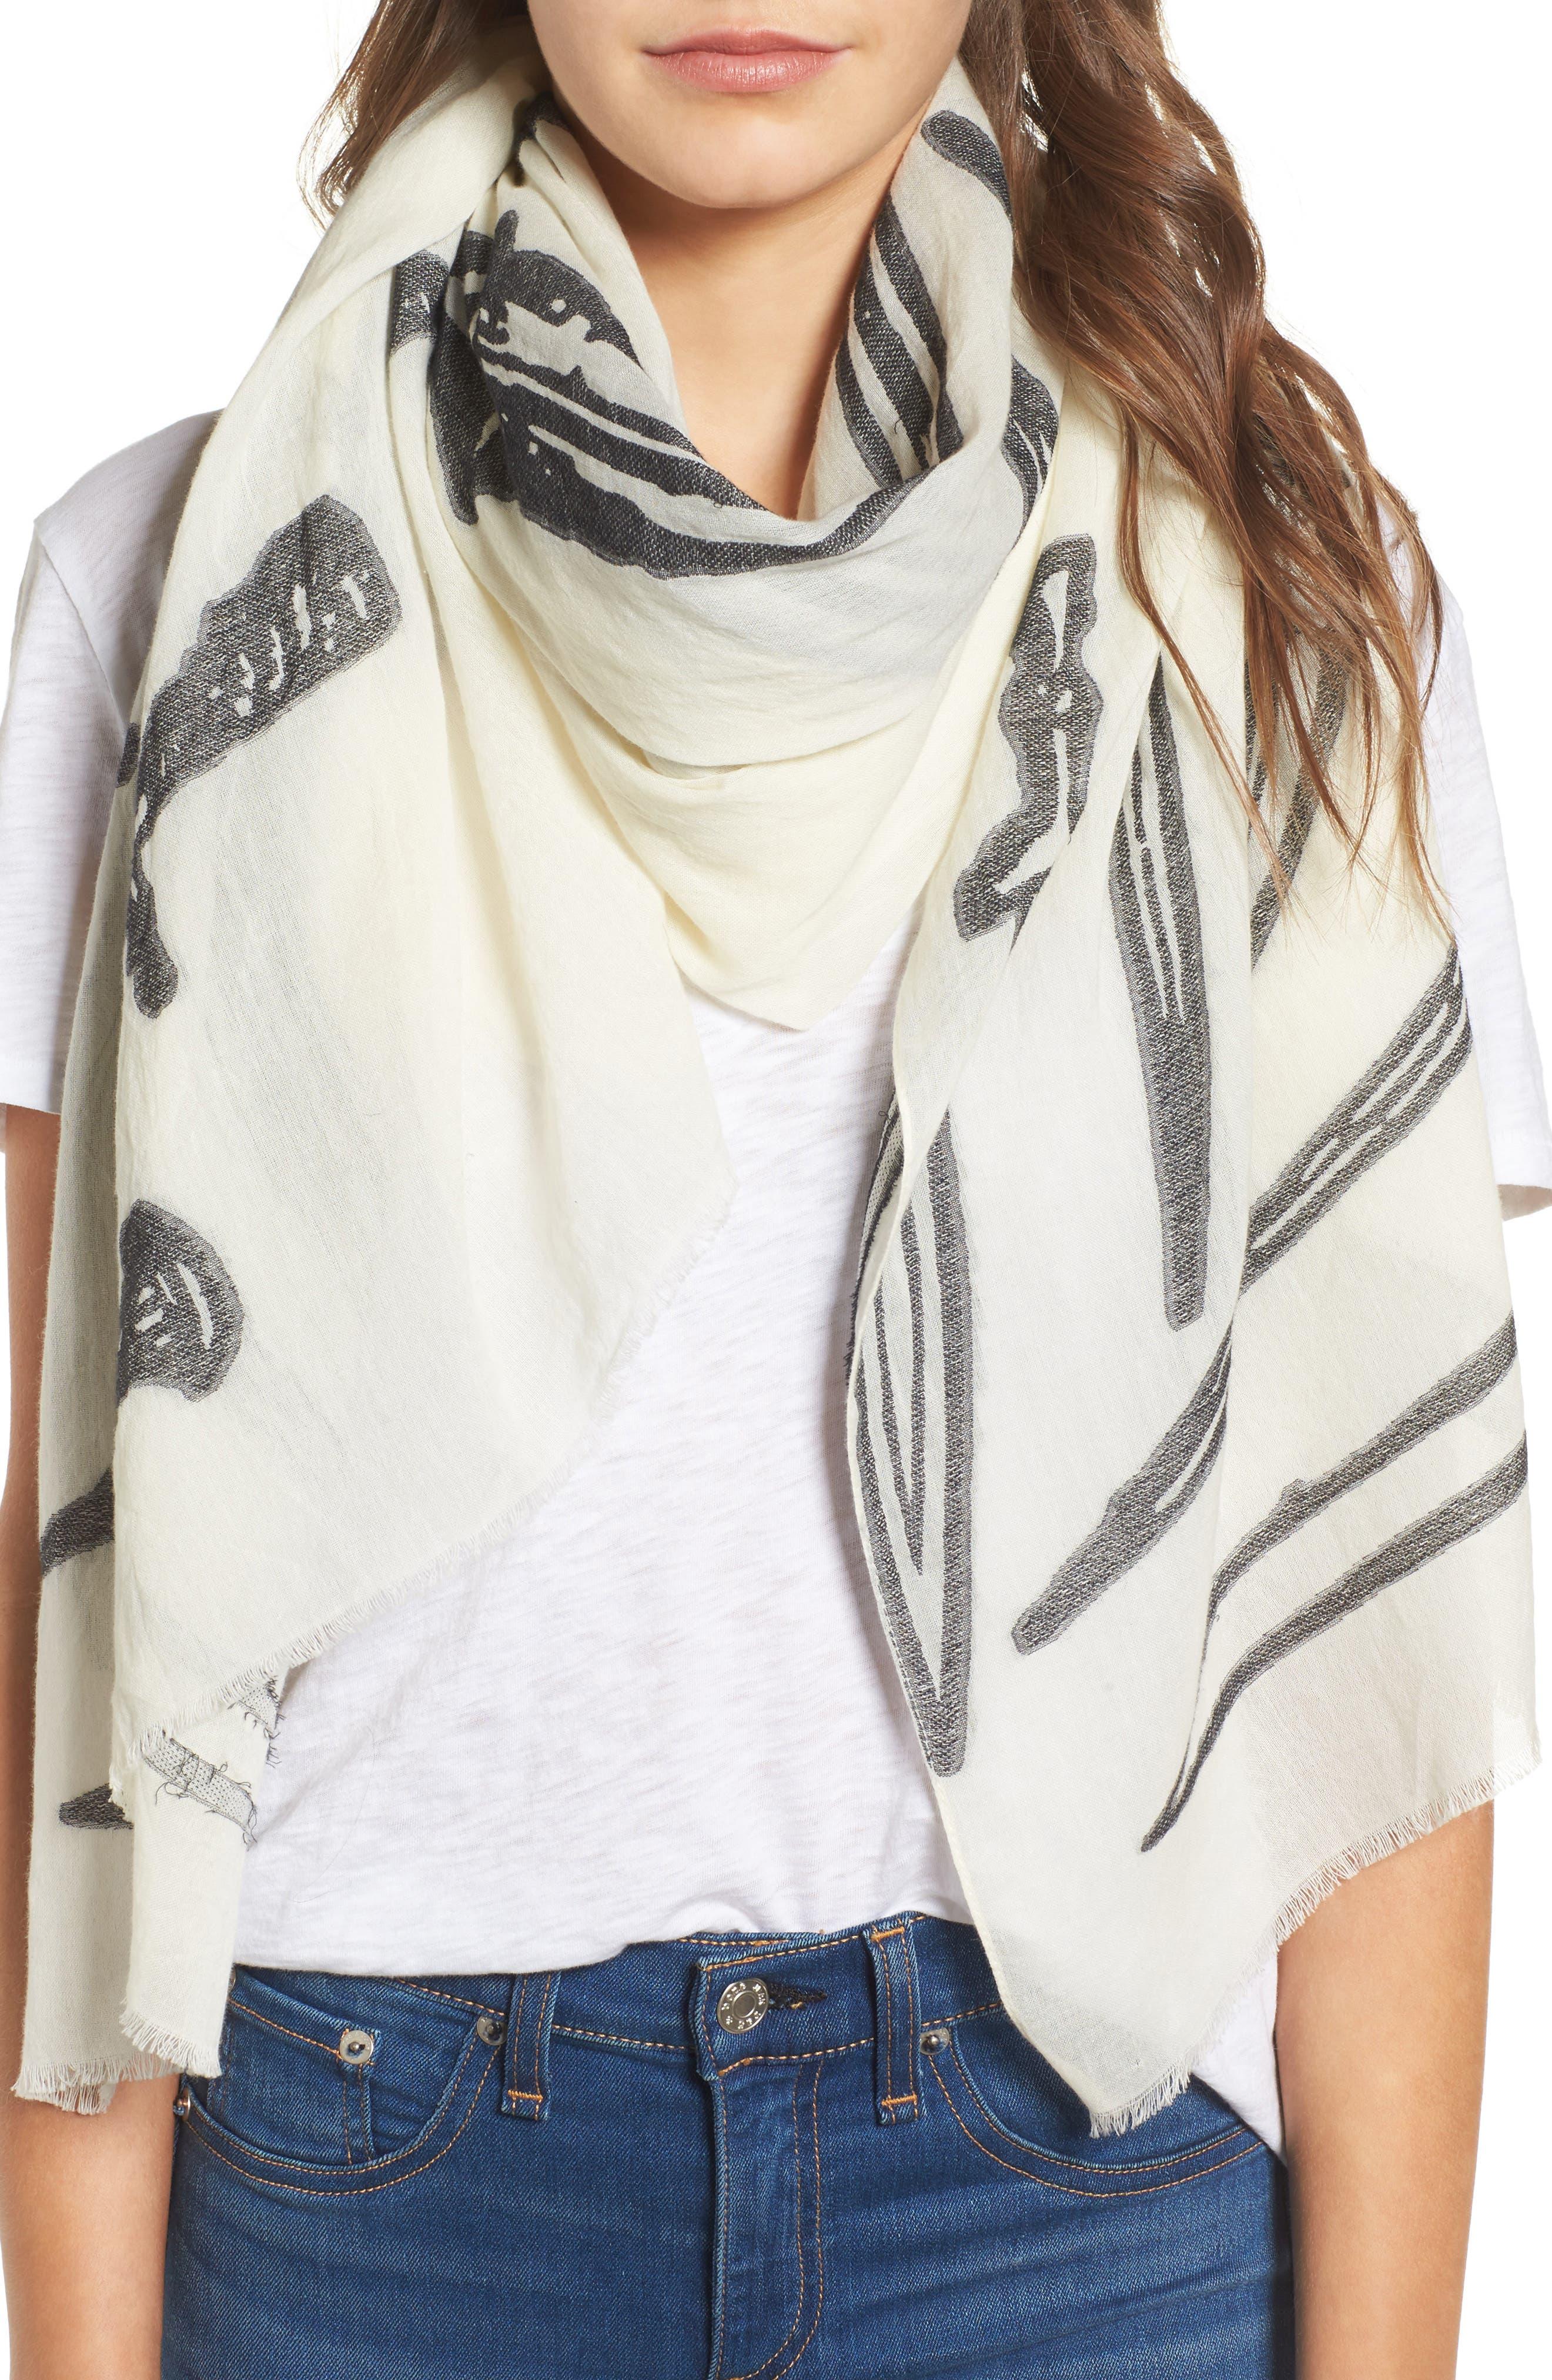 Main Image - rag & bone dagger print scarf